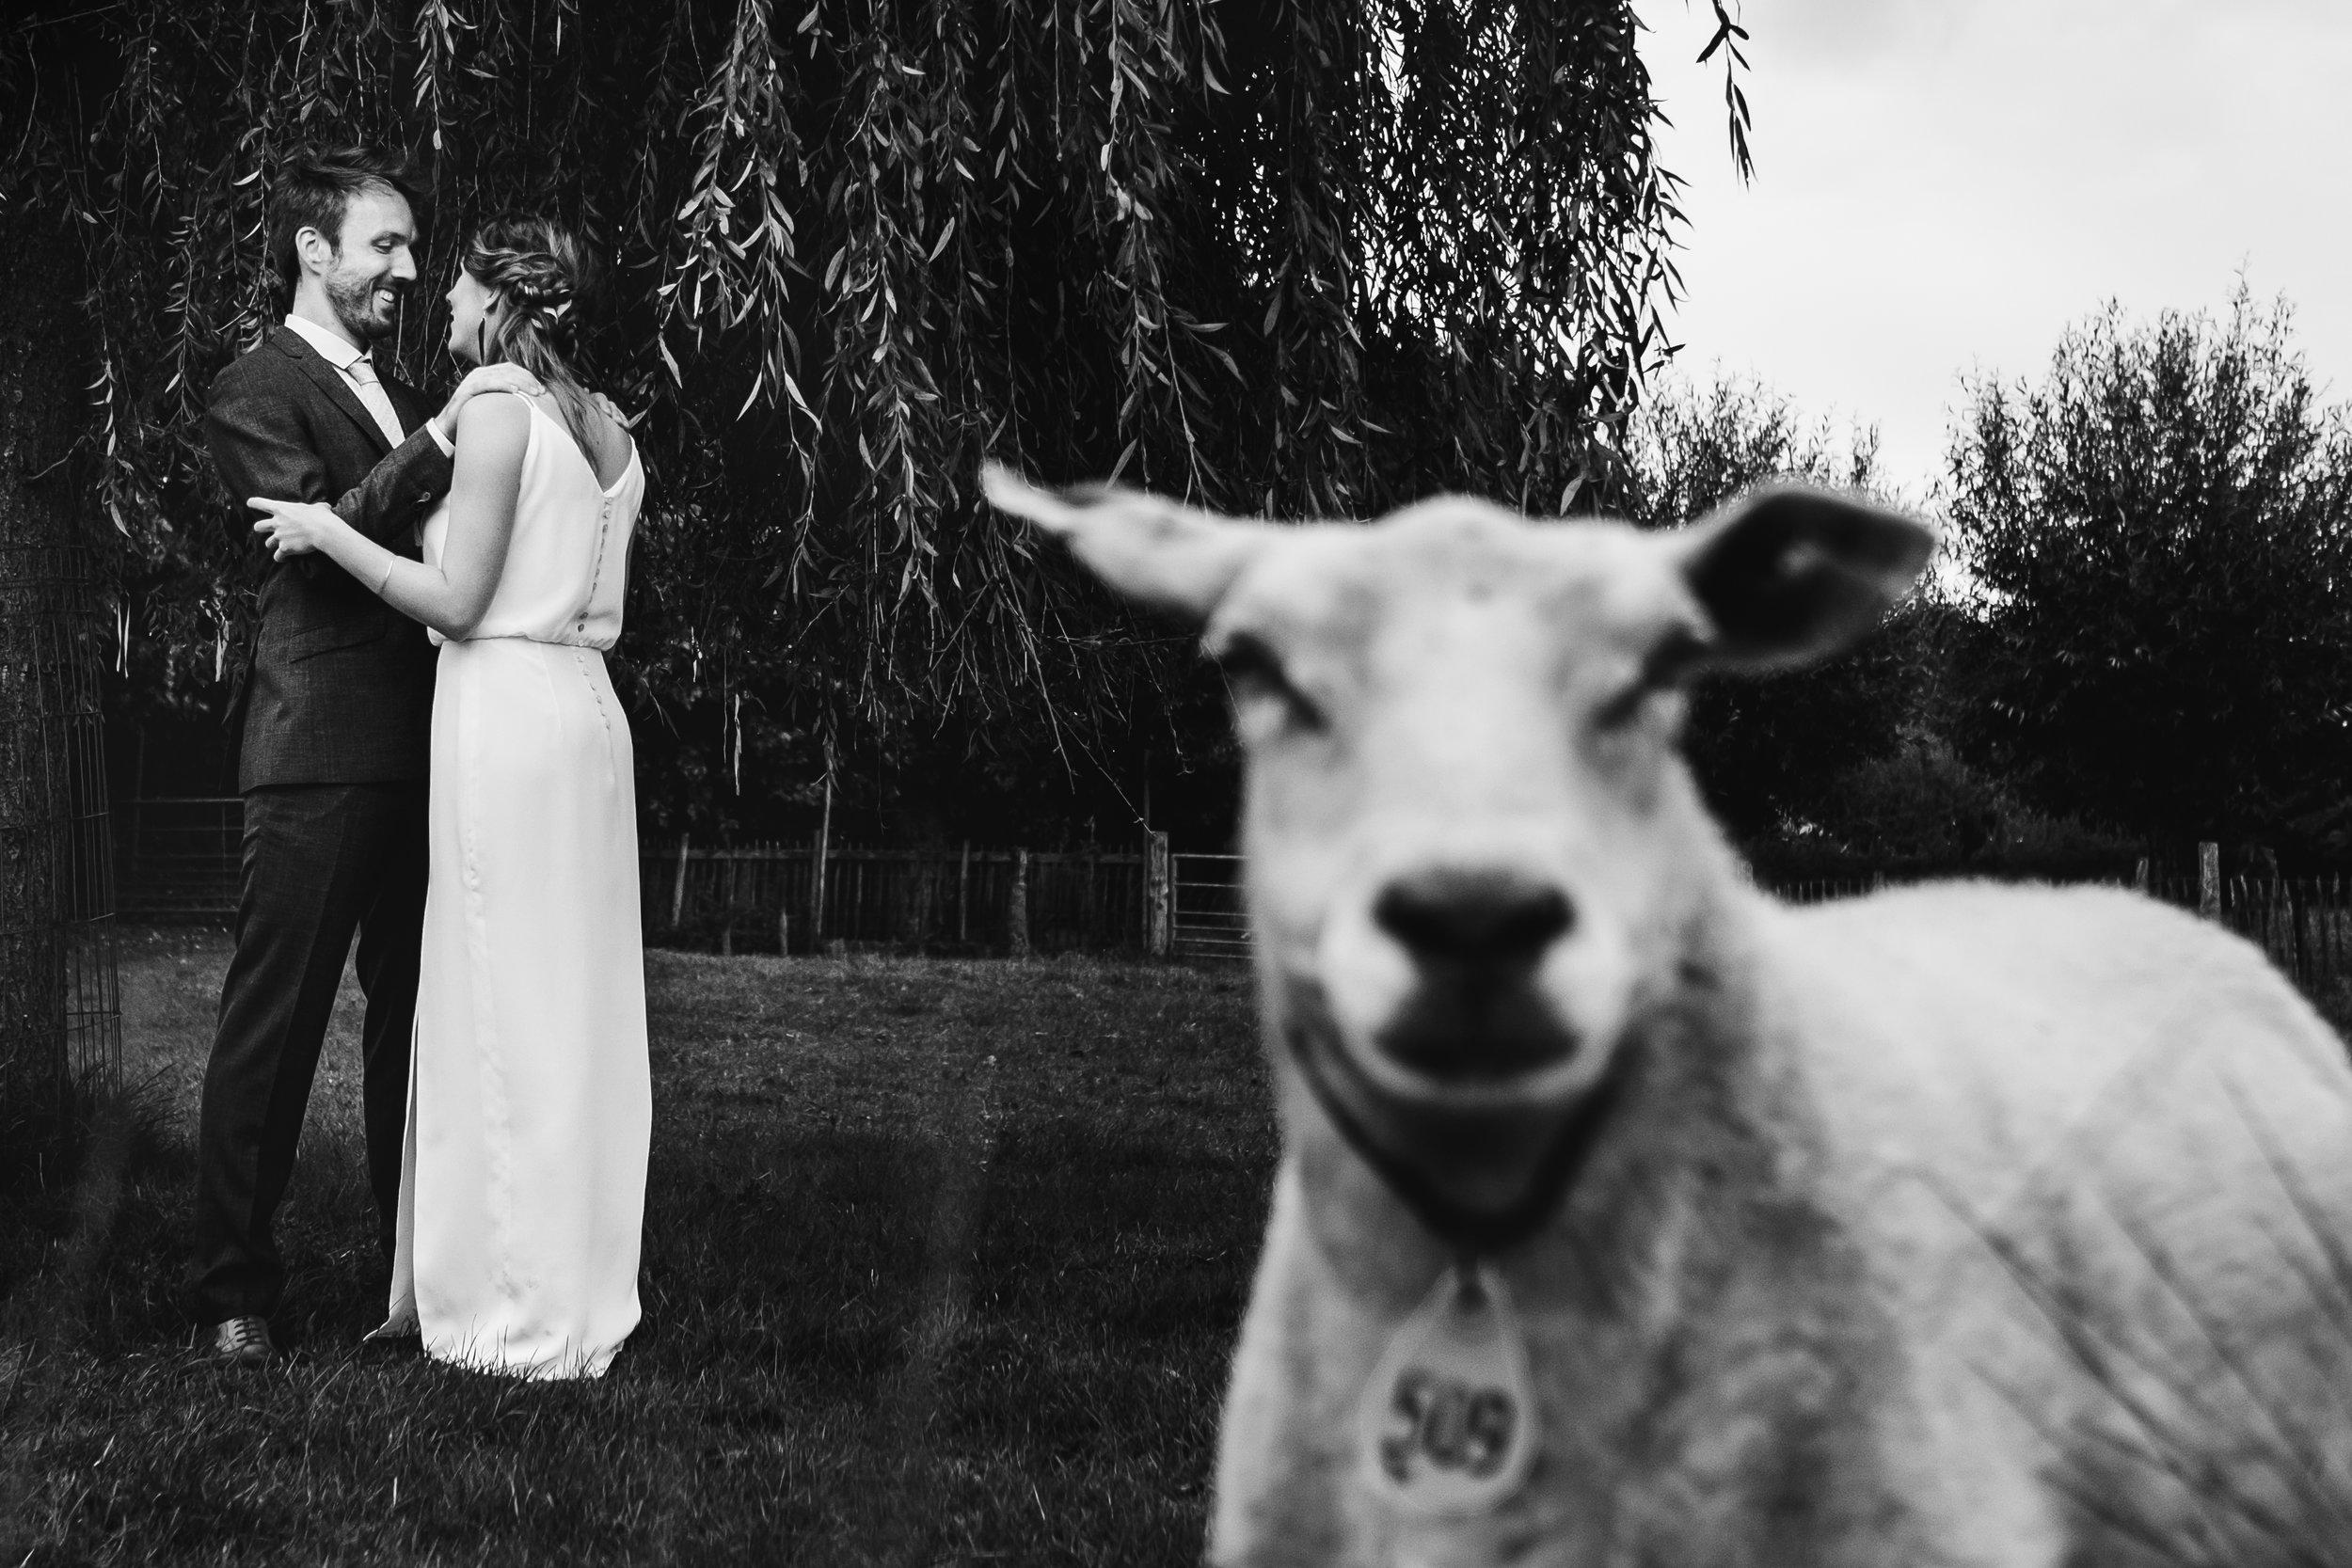 sheep on wedding photo